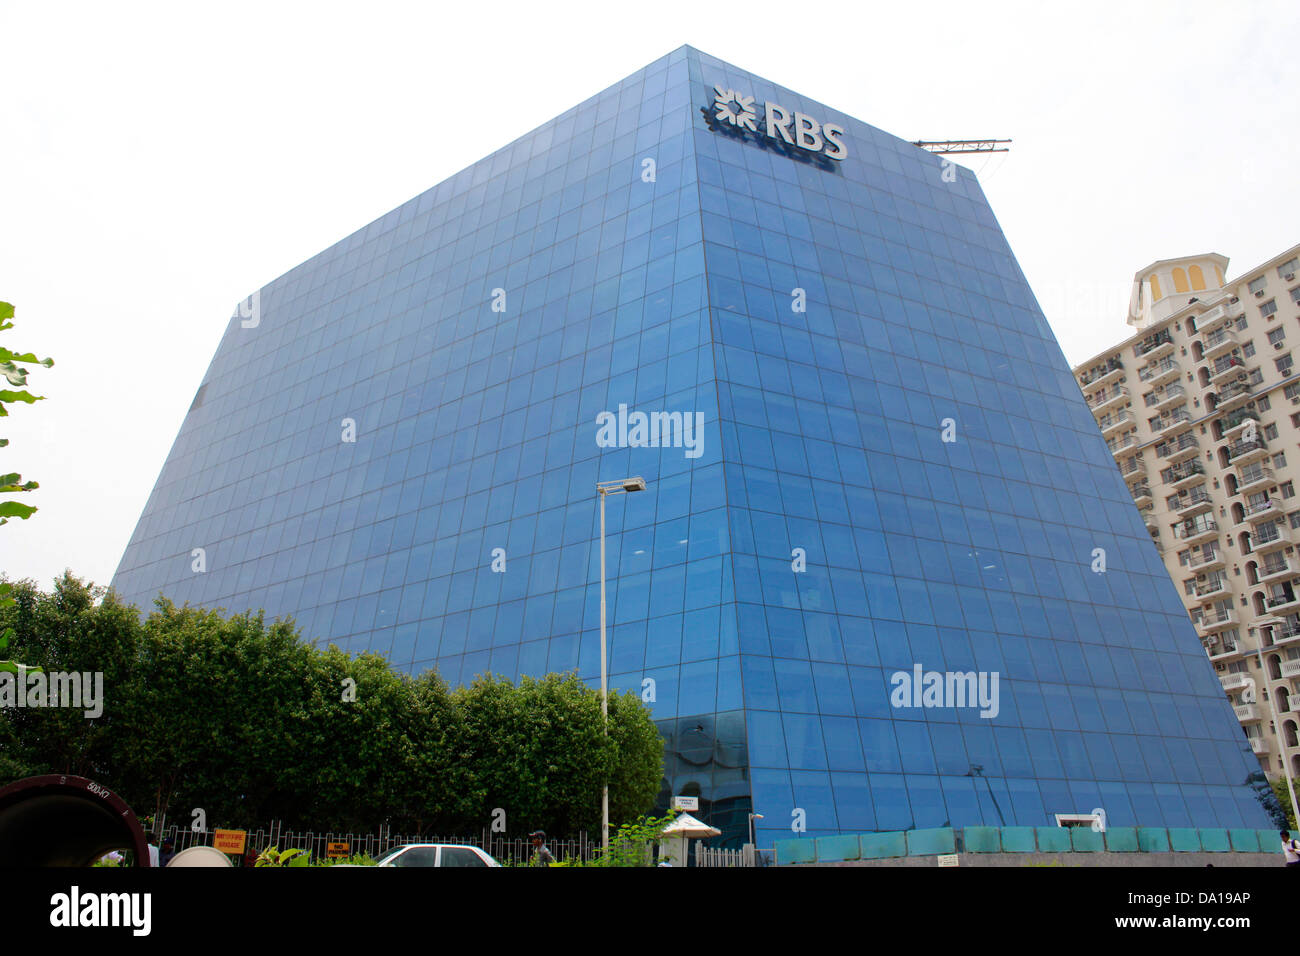 Corporate edifici per uffici a th DLF CYBER CITY, Gurgaon, regione NCR, India Immagini Stock